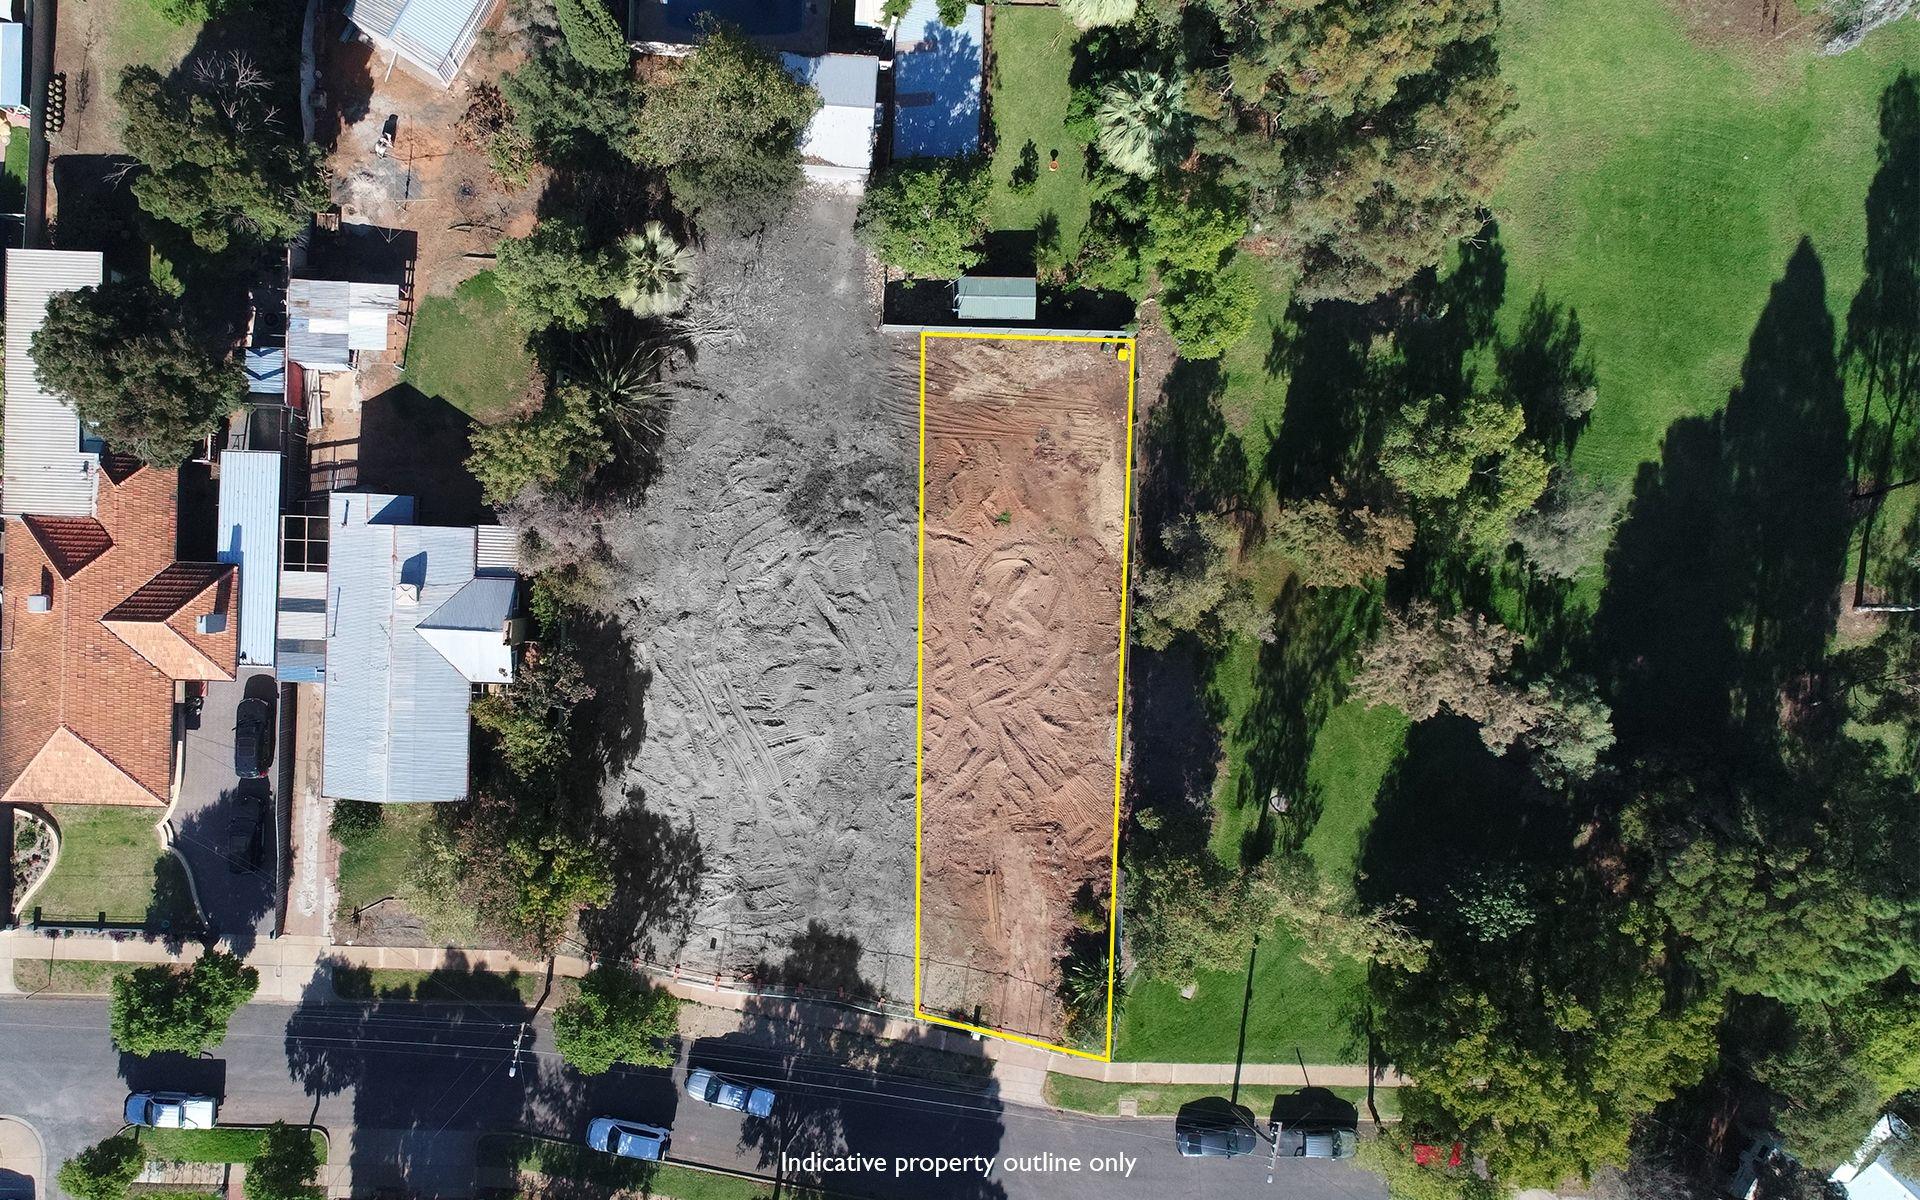 Lot 1A/5 Willow Grove, Mildura, VIC 3500